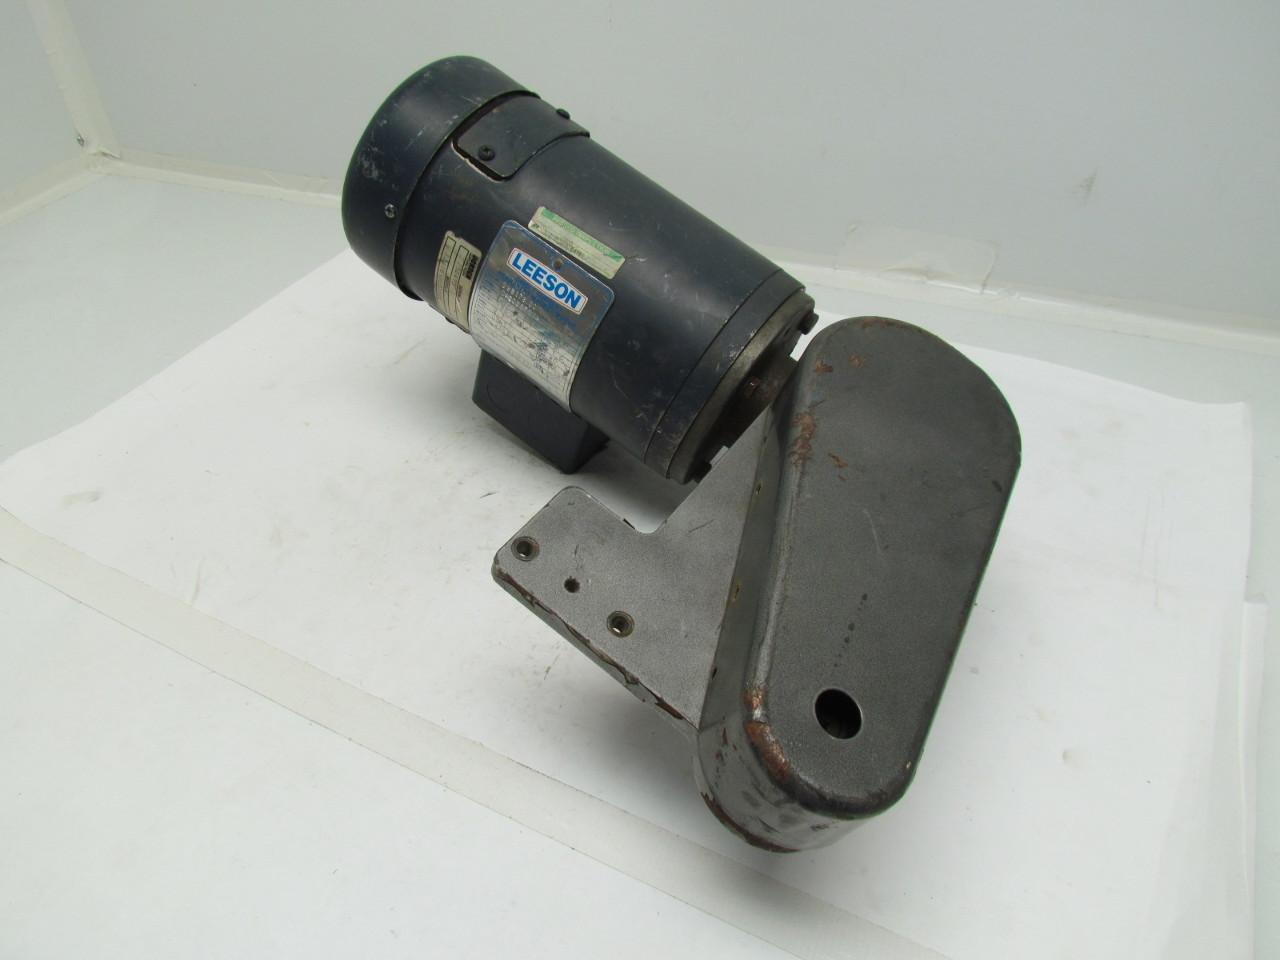 Leeson C42d28fc1a 130v Dc Convetor Motor 1 4hp 2500rpm W